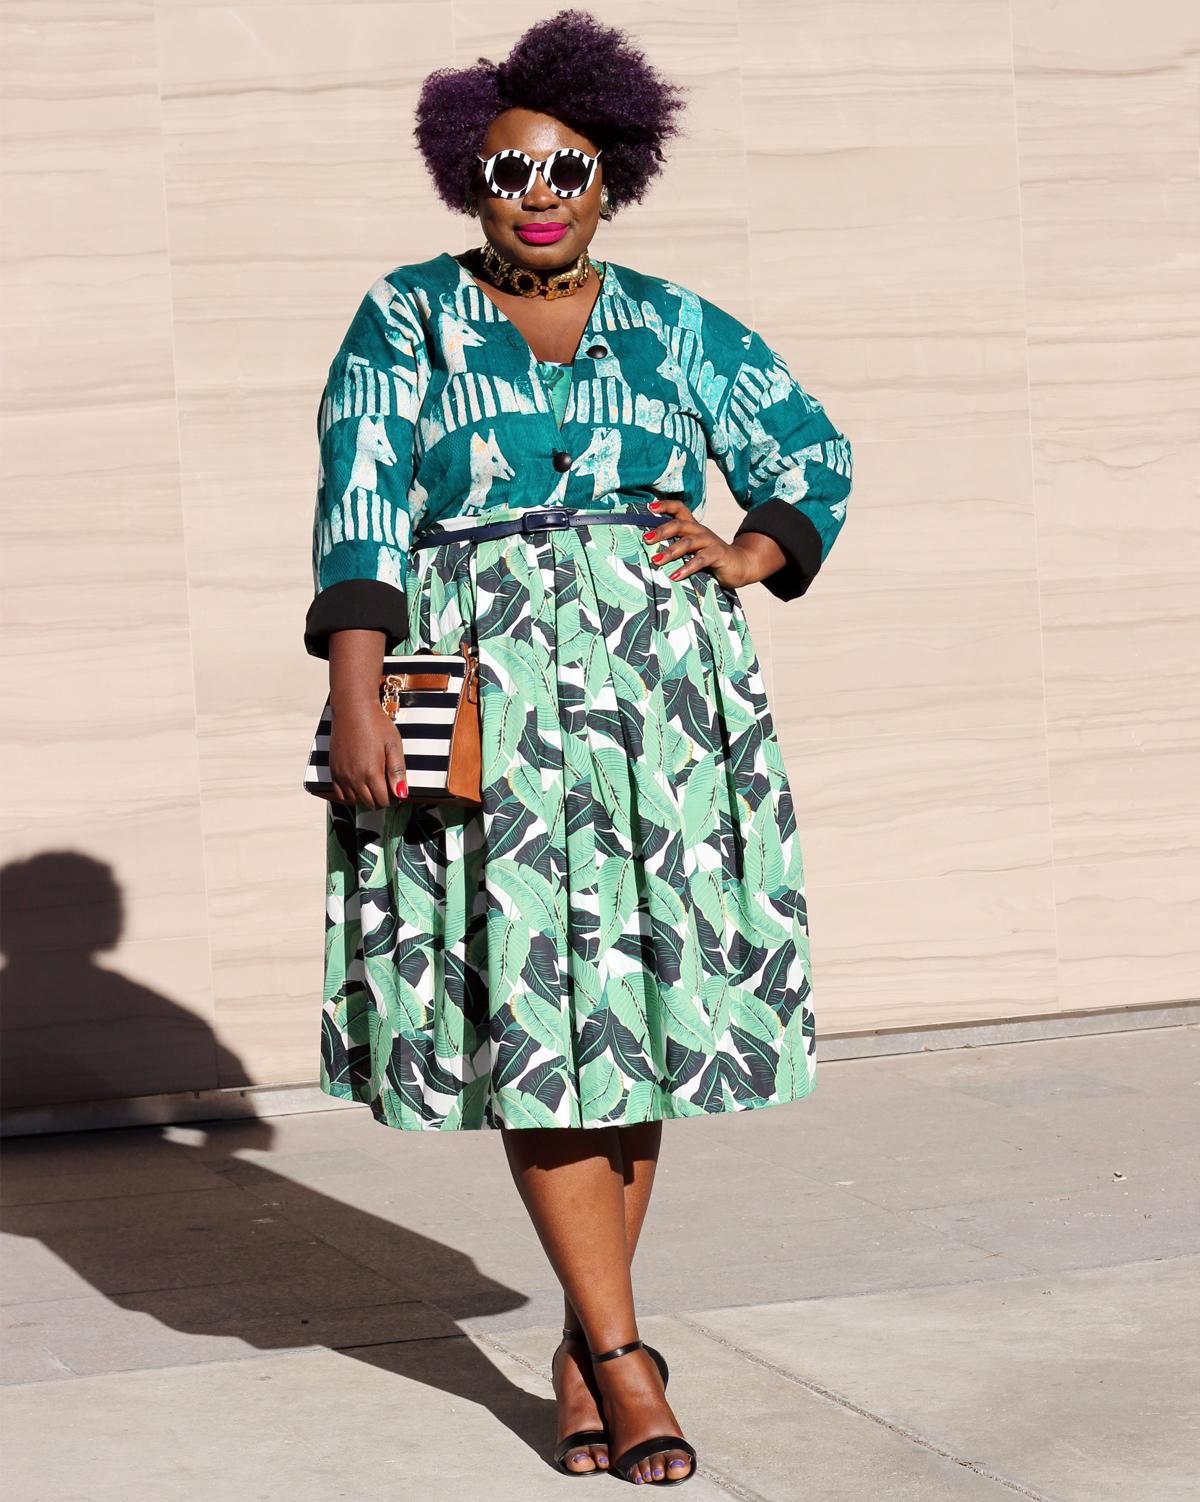 plus-size-style-fashion-week-outfit-fashion-week-street-style-01.jpg